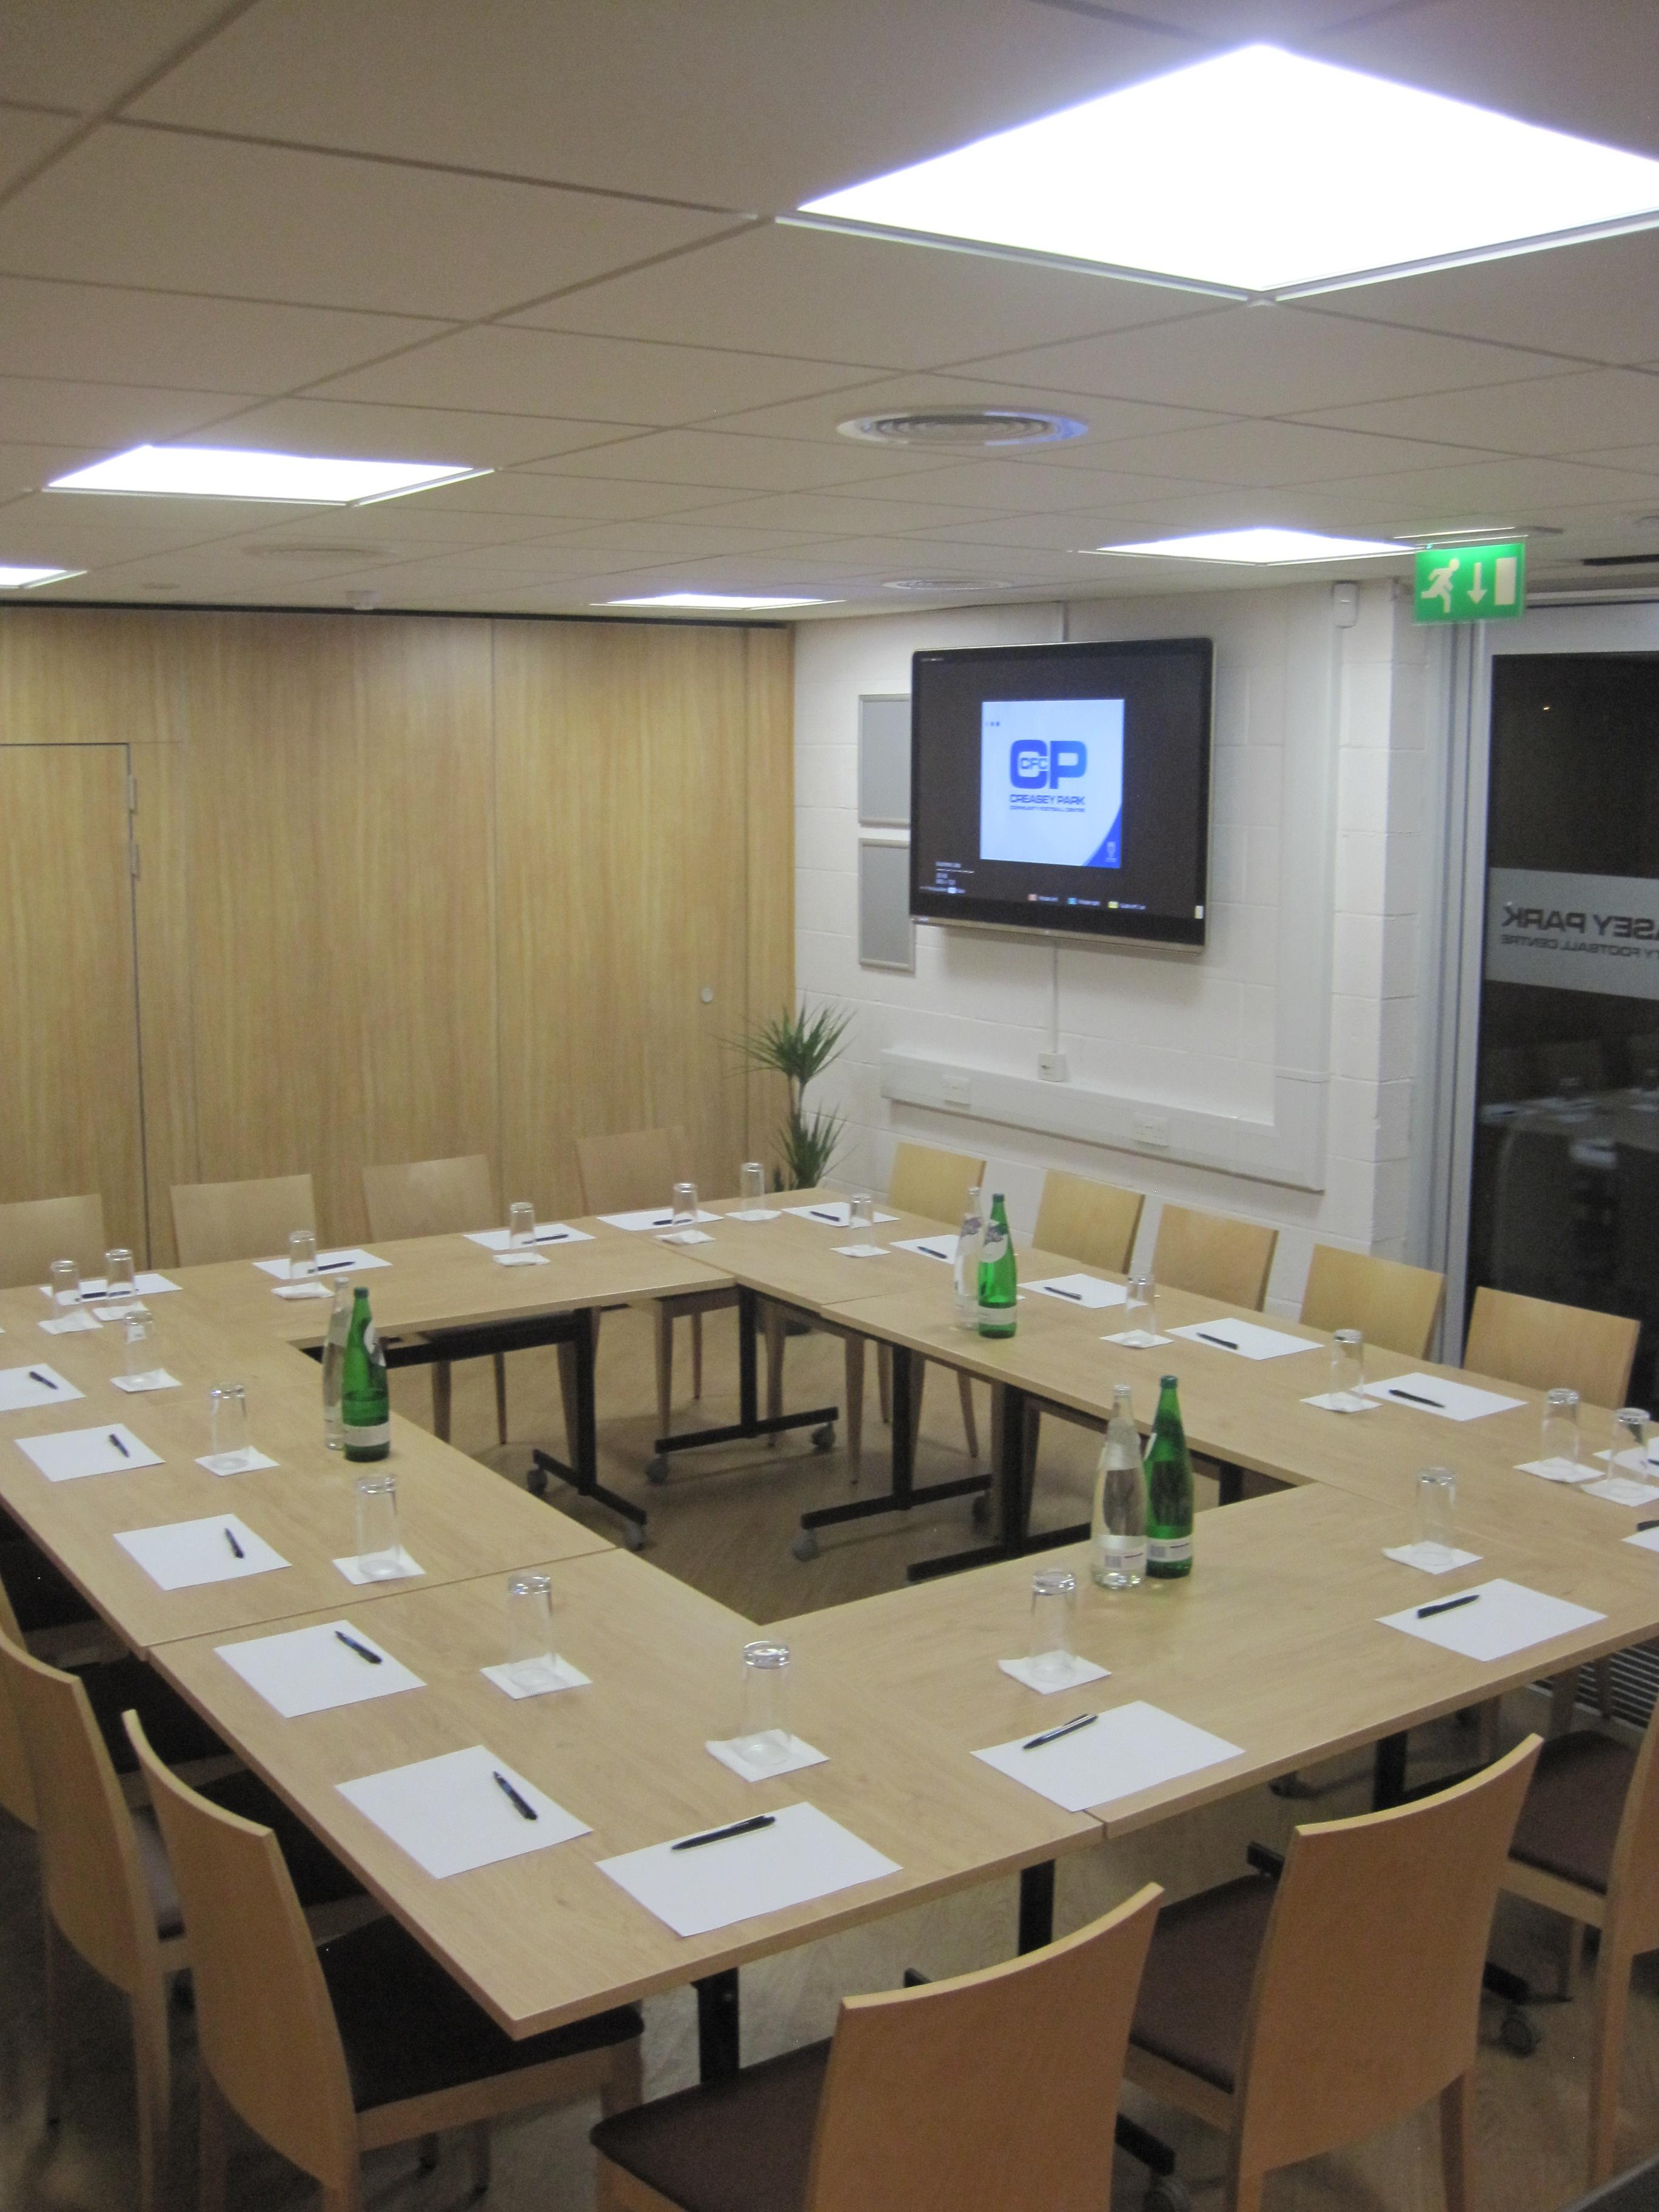 Creasey Park Community Football Centre meeting room